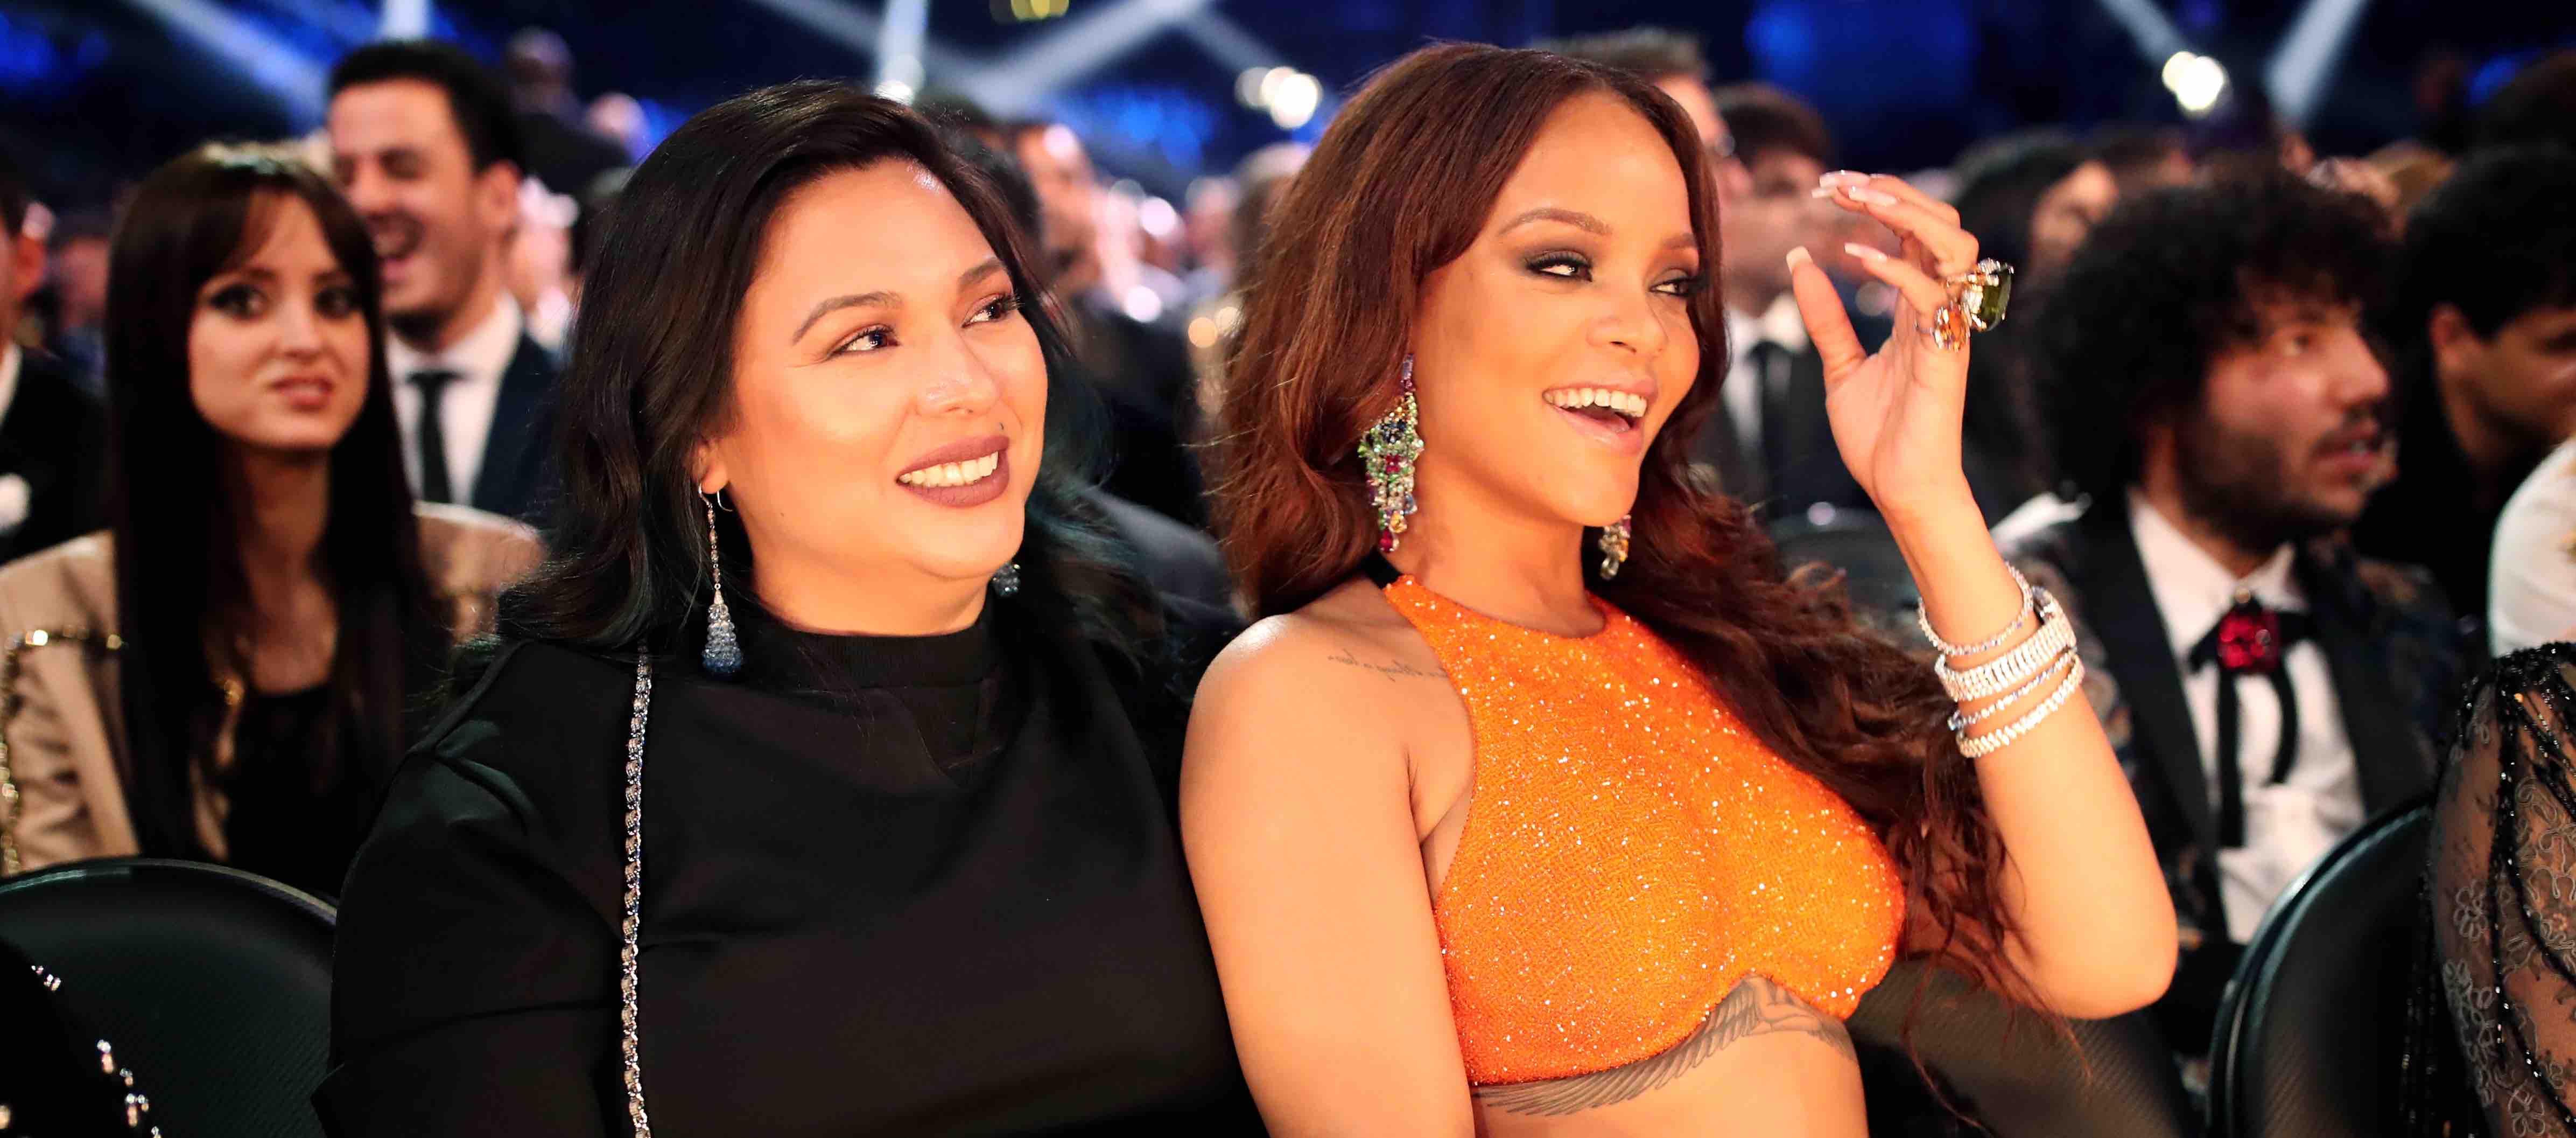 Meet Jenn Rosales, Rihanna's Right-Hand Woman